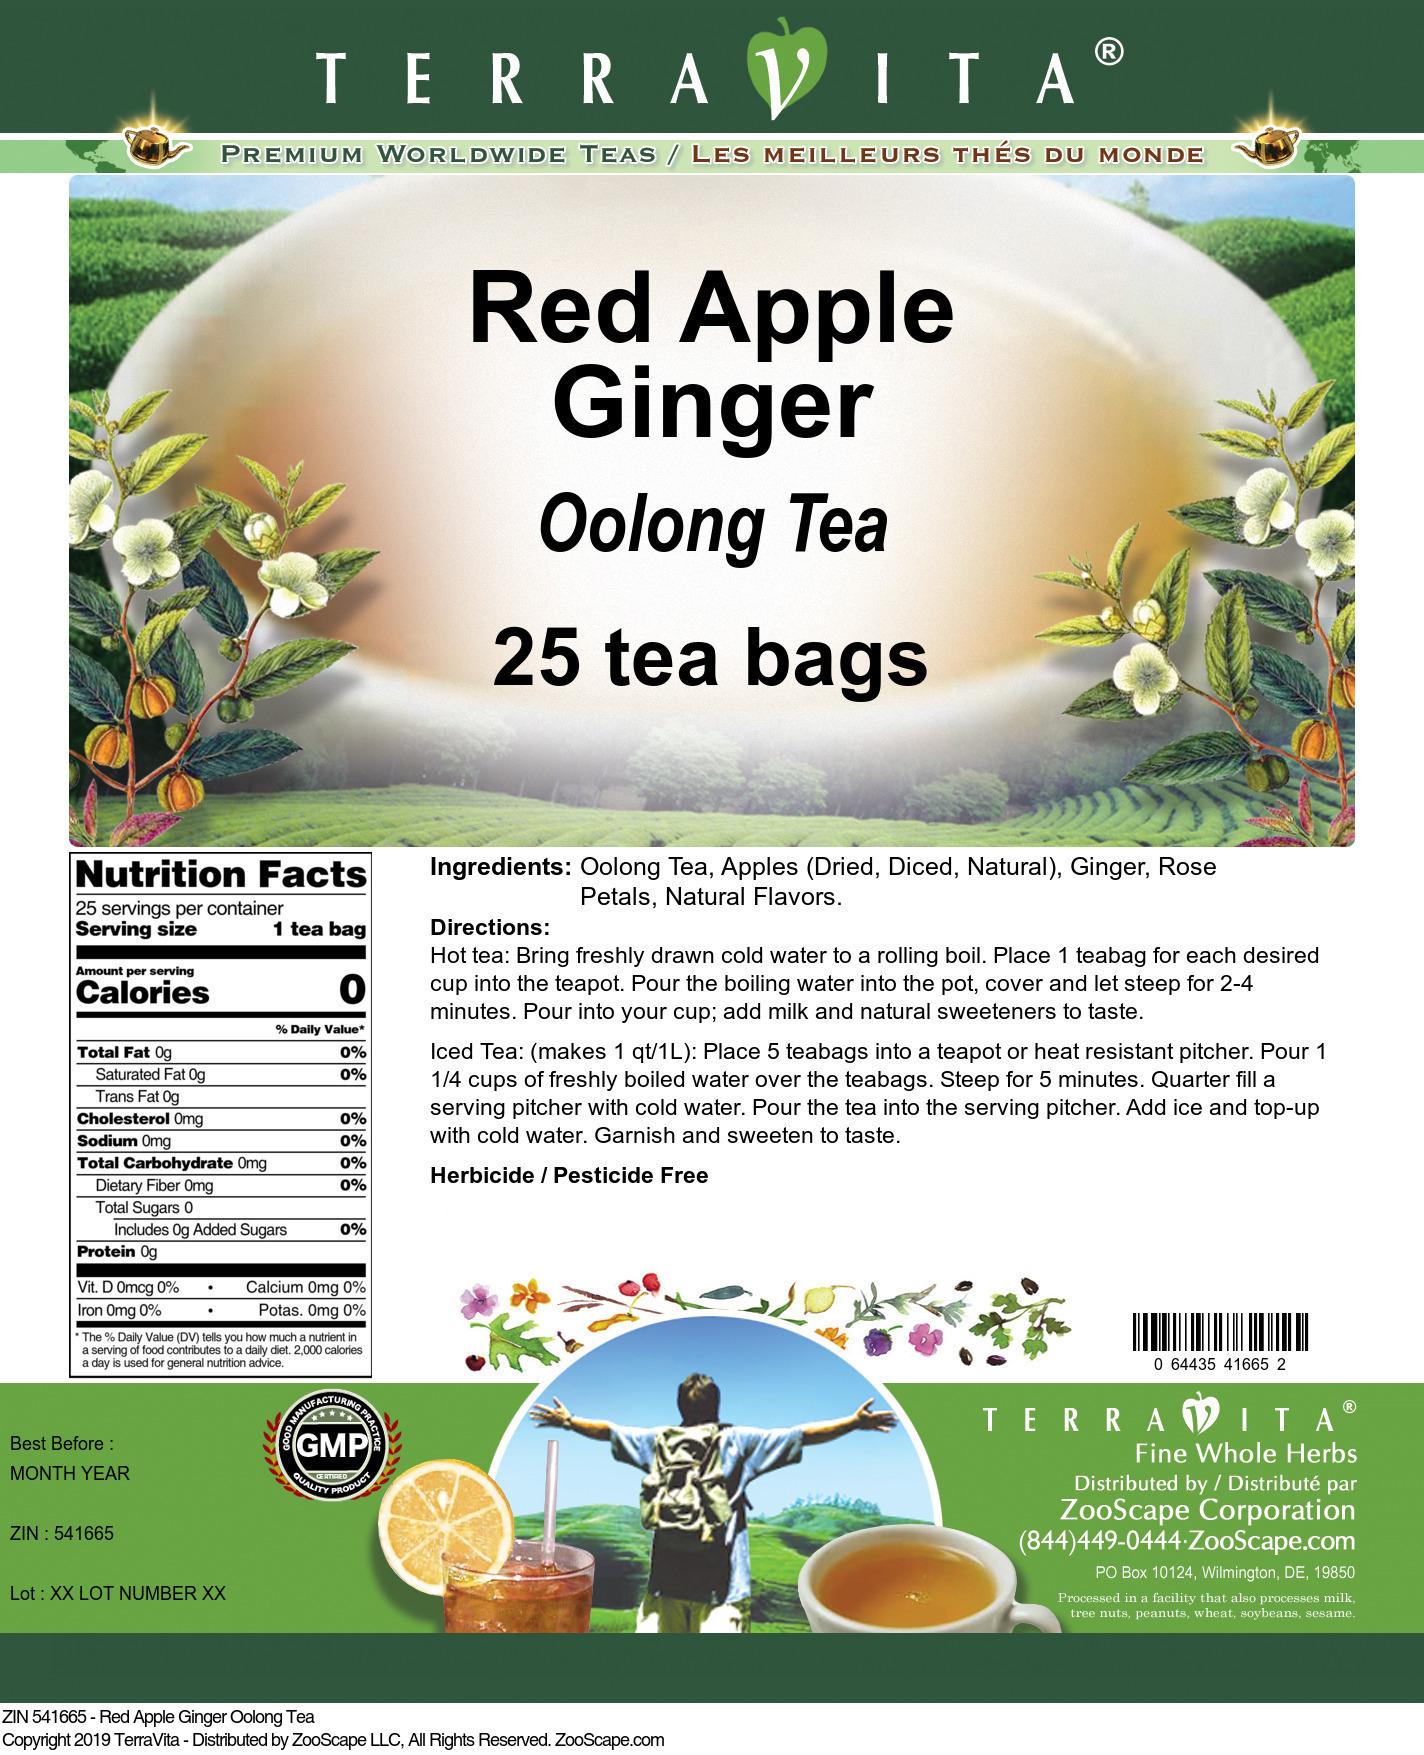 Red Apple Ginger Oolong Tea